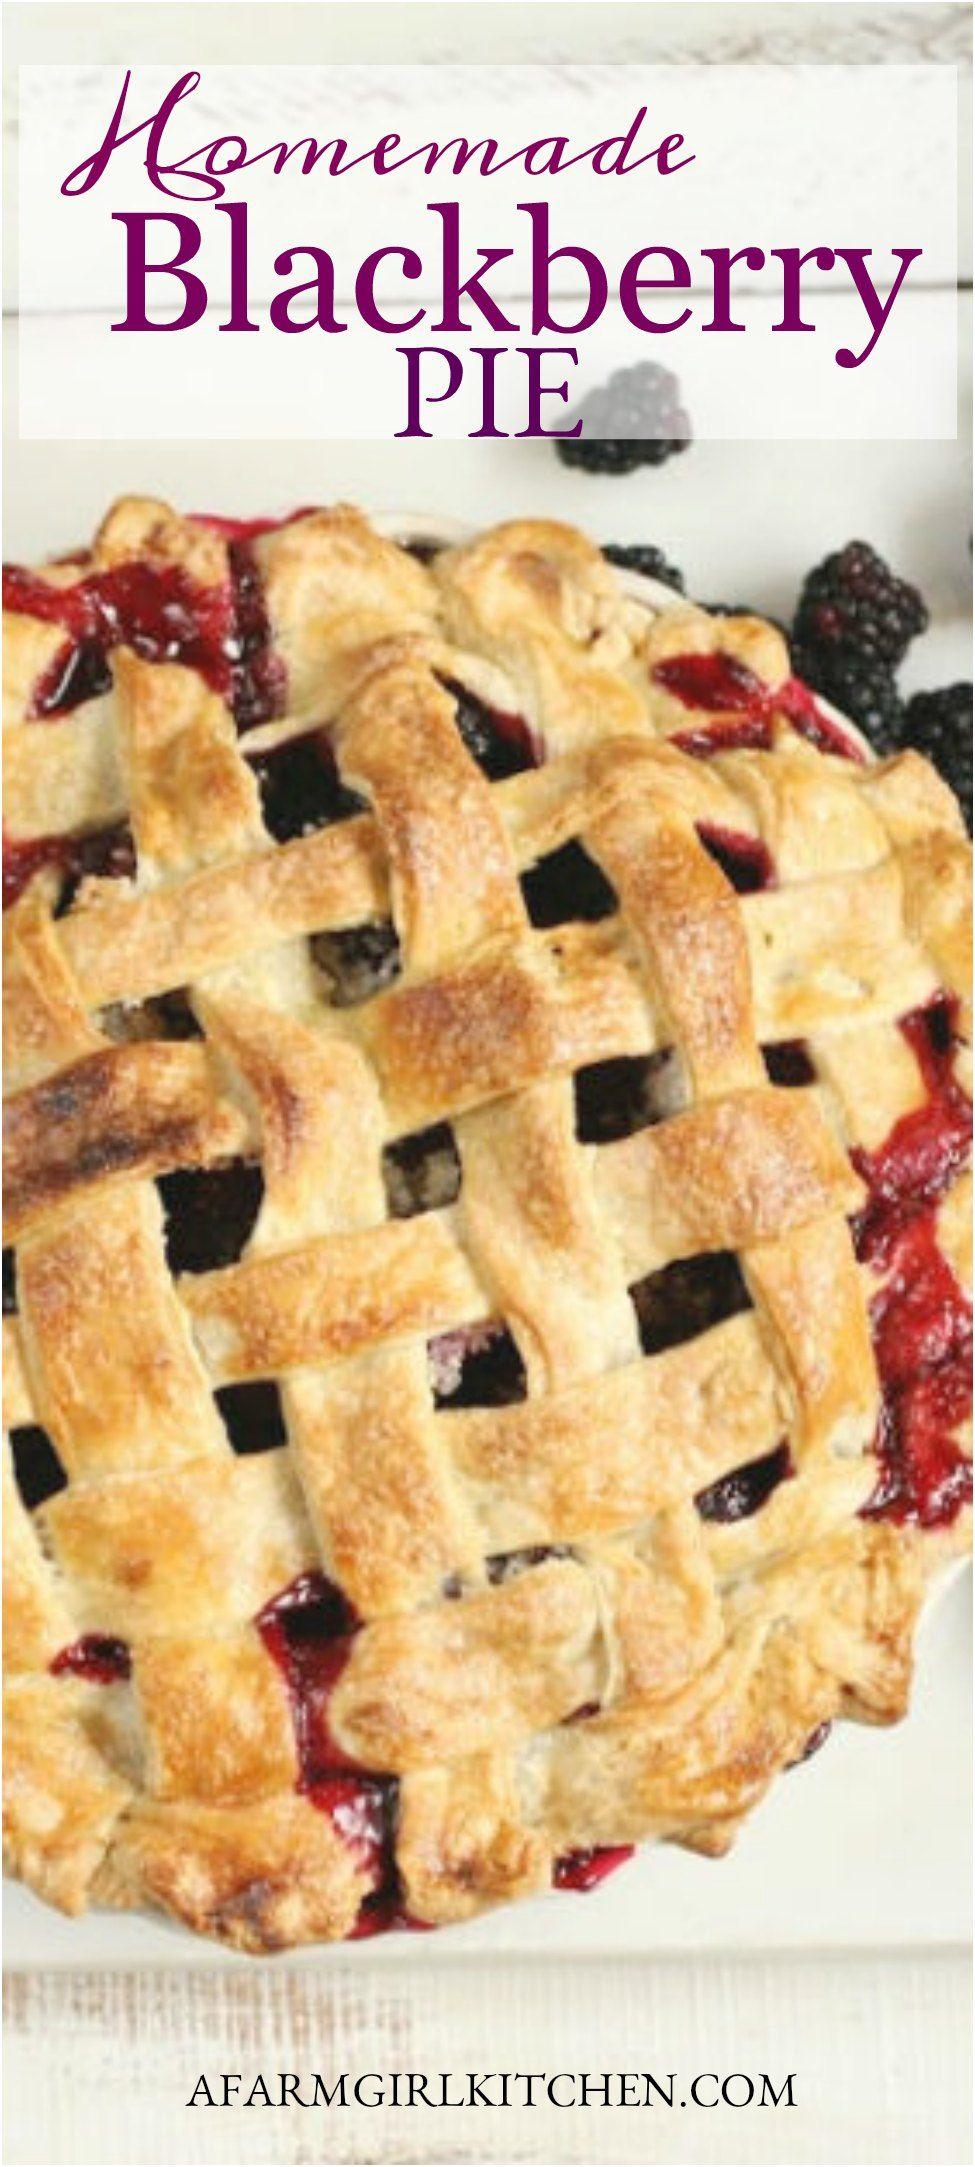 how to freeze blackberries for pie